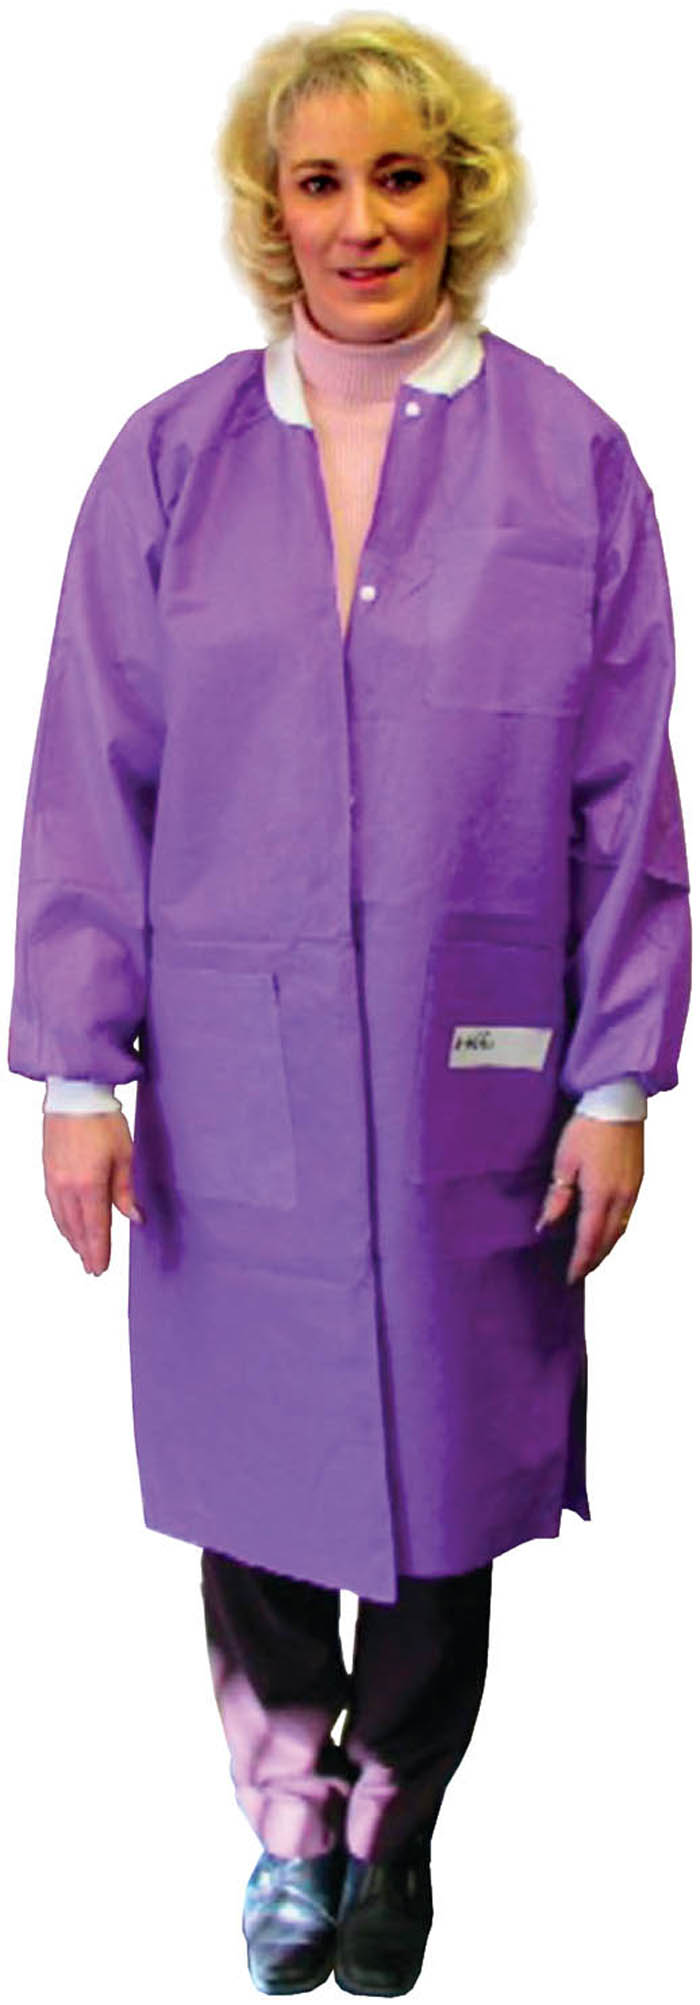 Disposable Lab Jacket. Hip length. Teal Green. X-Large.